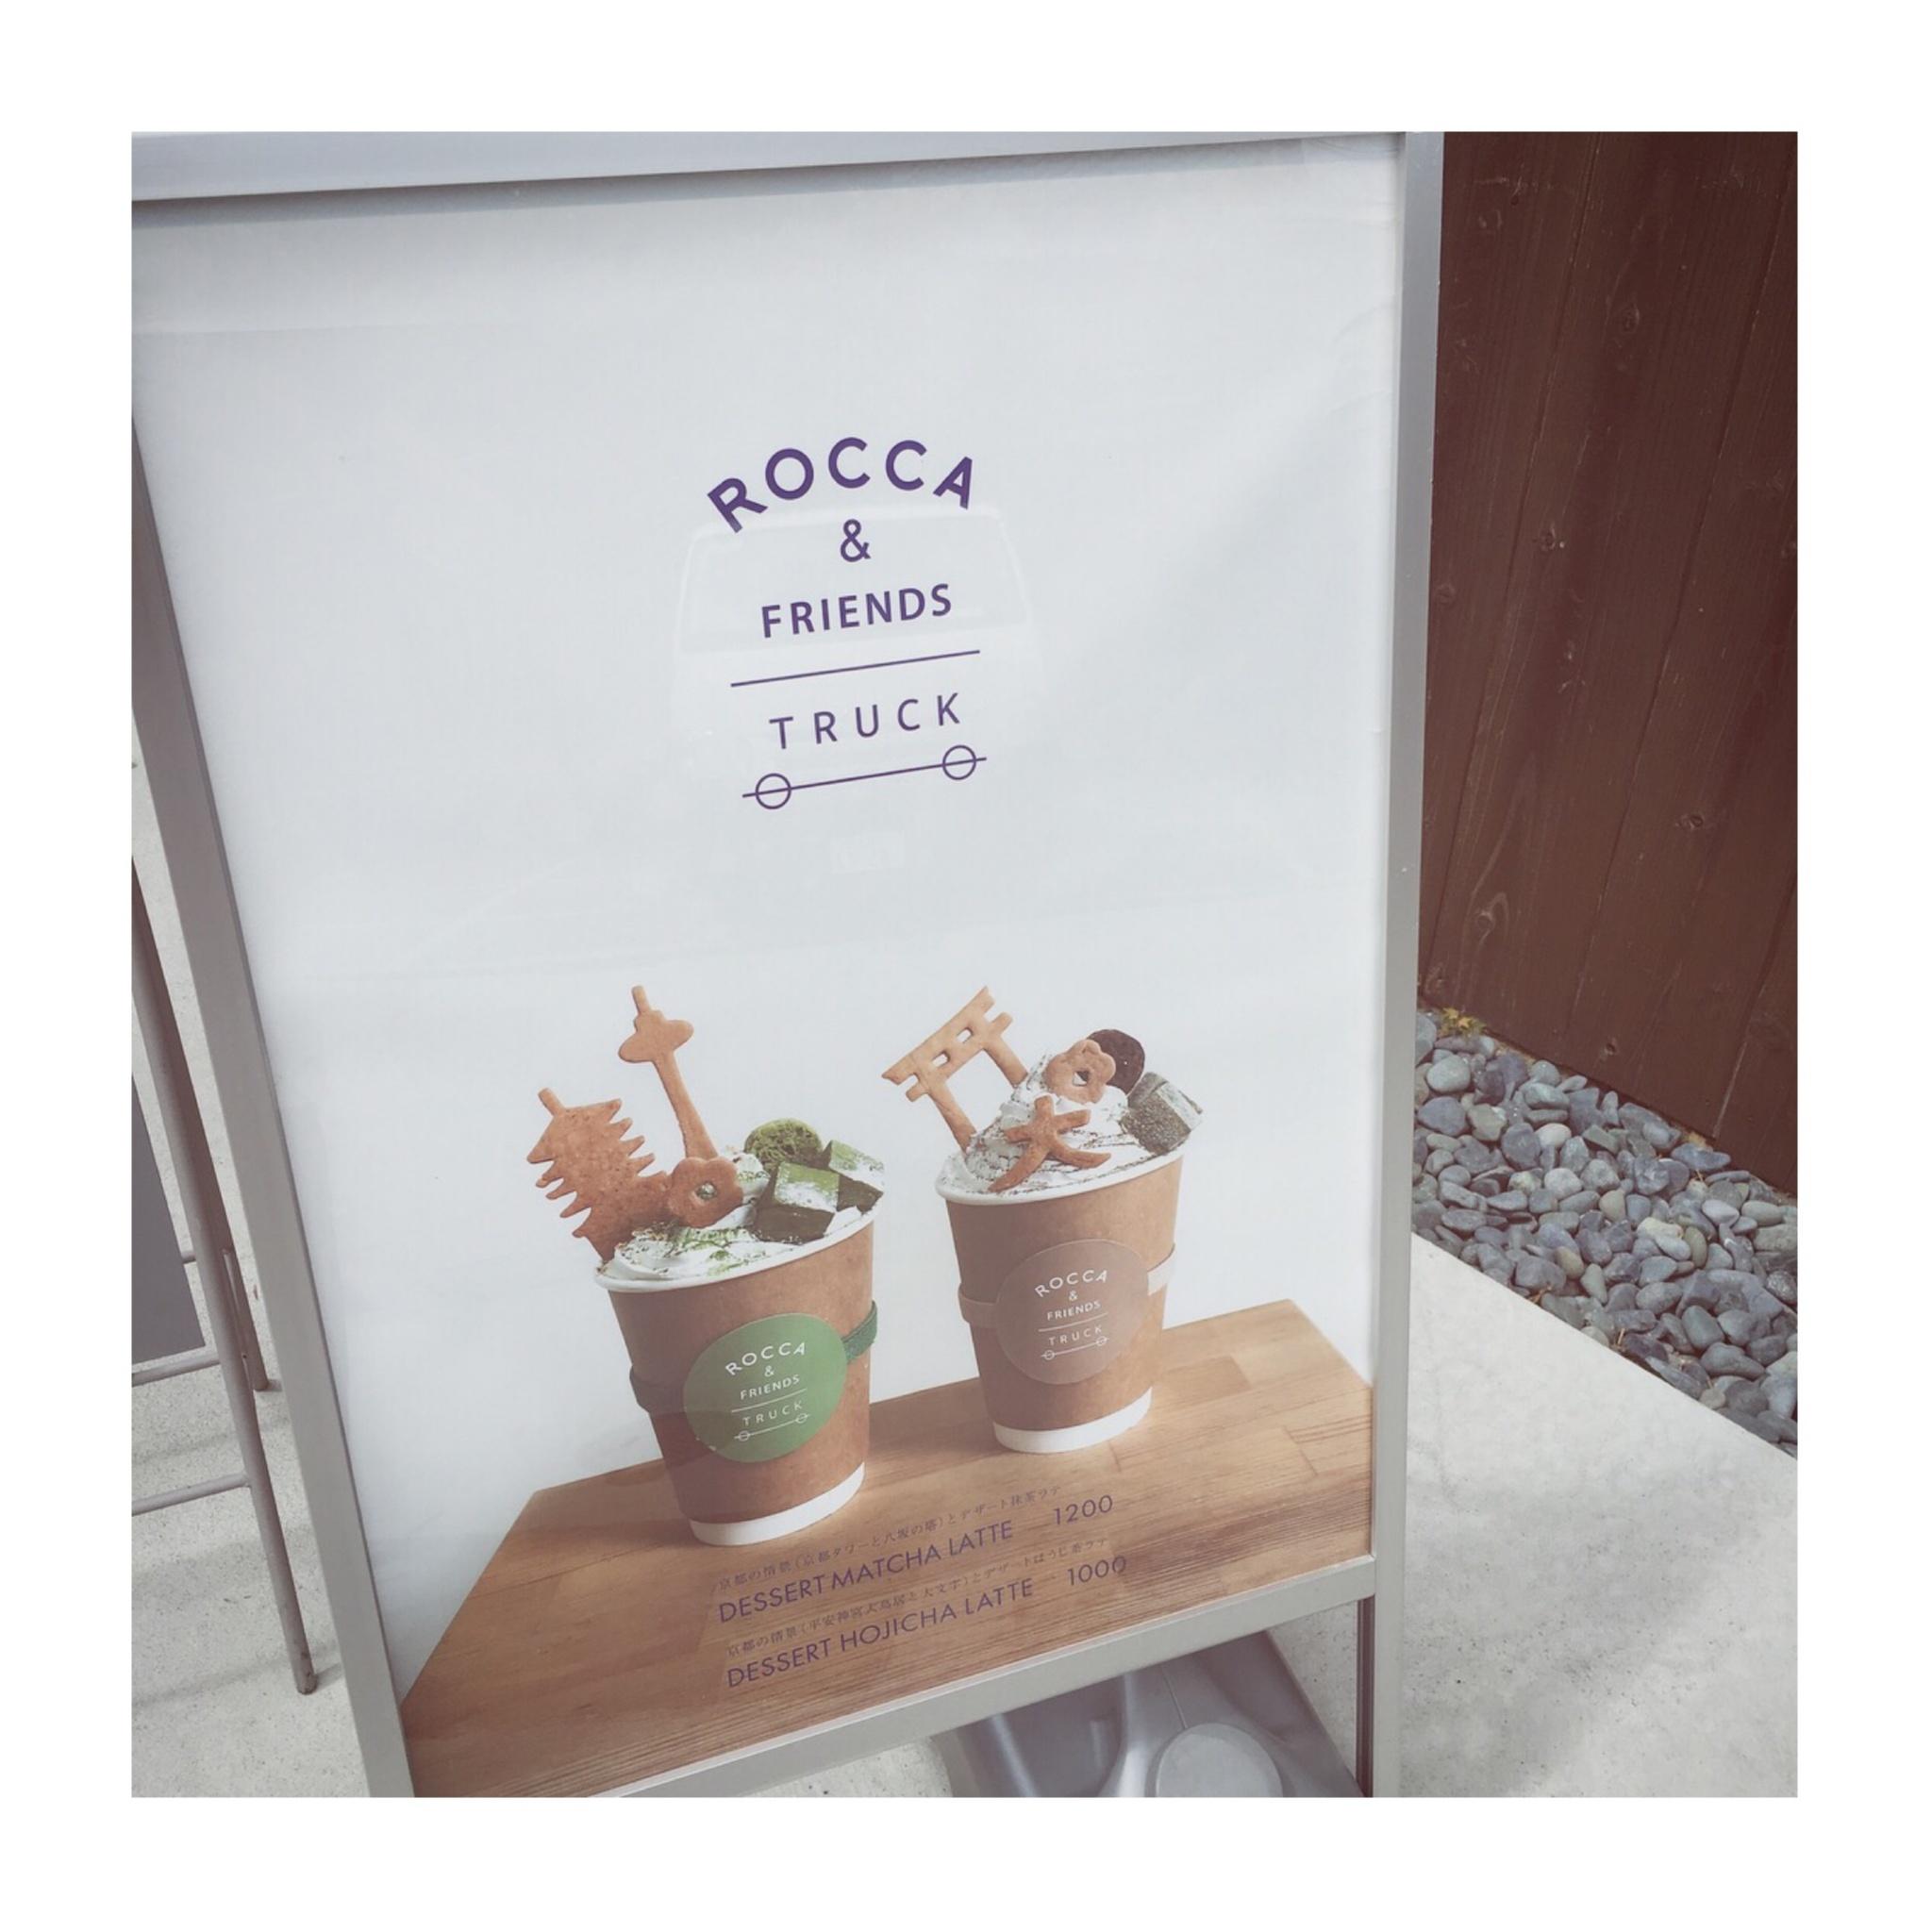 #5【#cafestagram】❤️:《京都》に行ったら絶対飲みたい!ROCCA&FRIENDS TRUCKの抹茶ラテがかわいすぎる◡̈_2